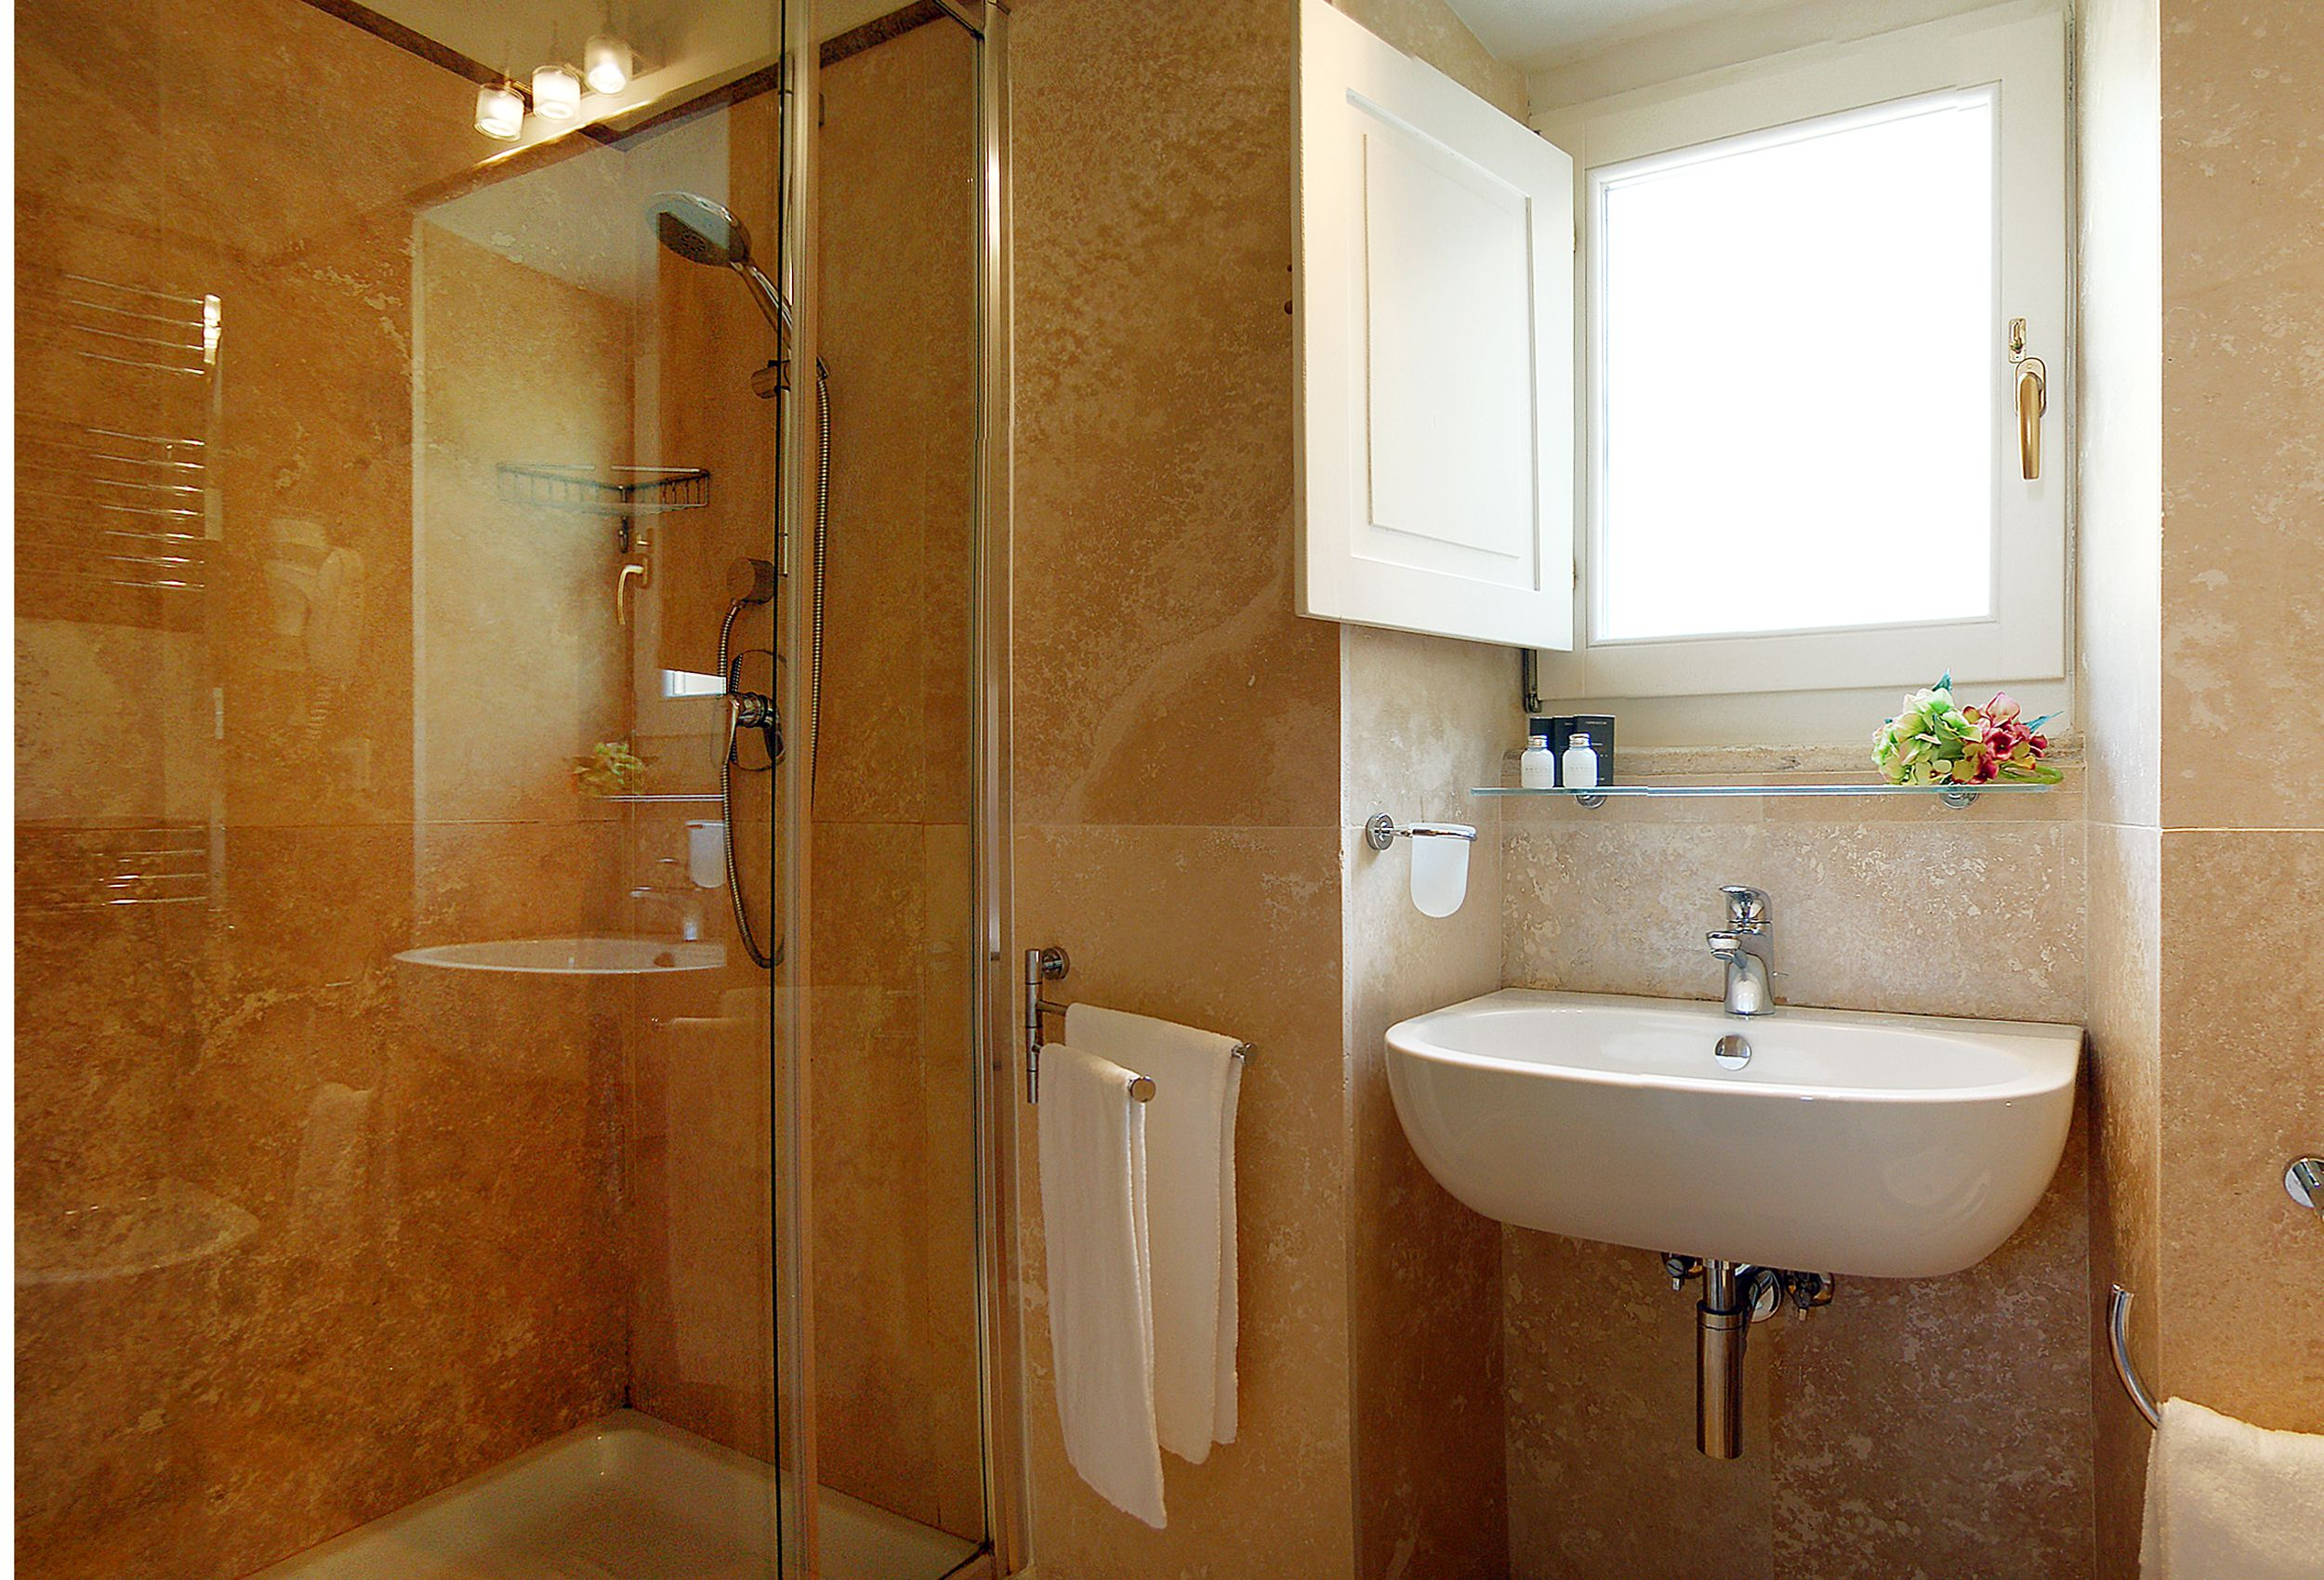 Navona Luxury Apartments, Monolocale Deluxe con terrazza